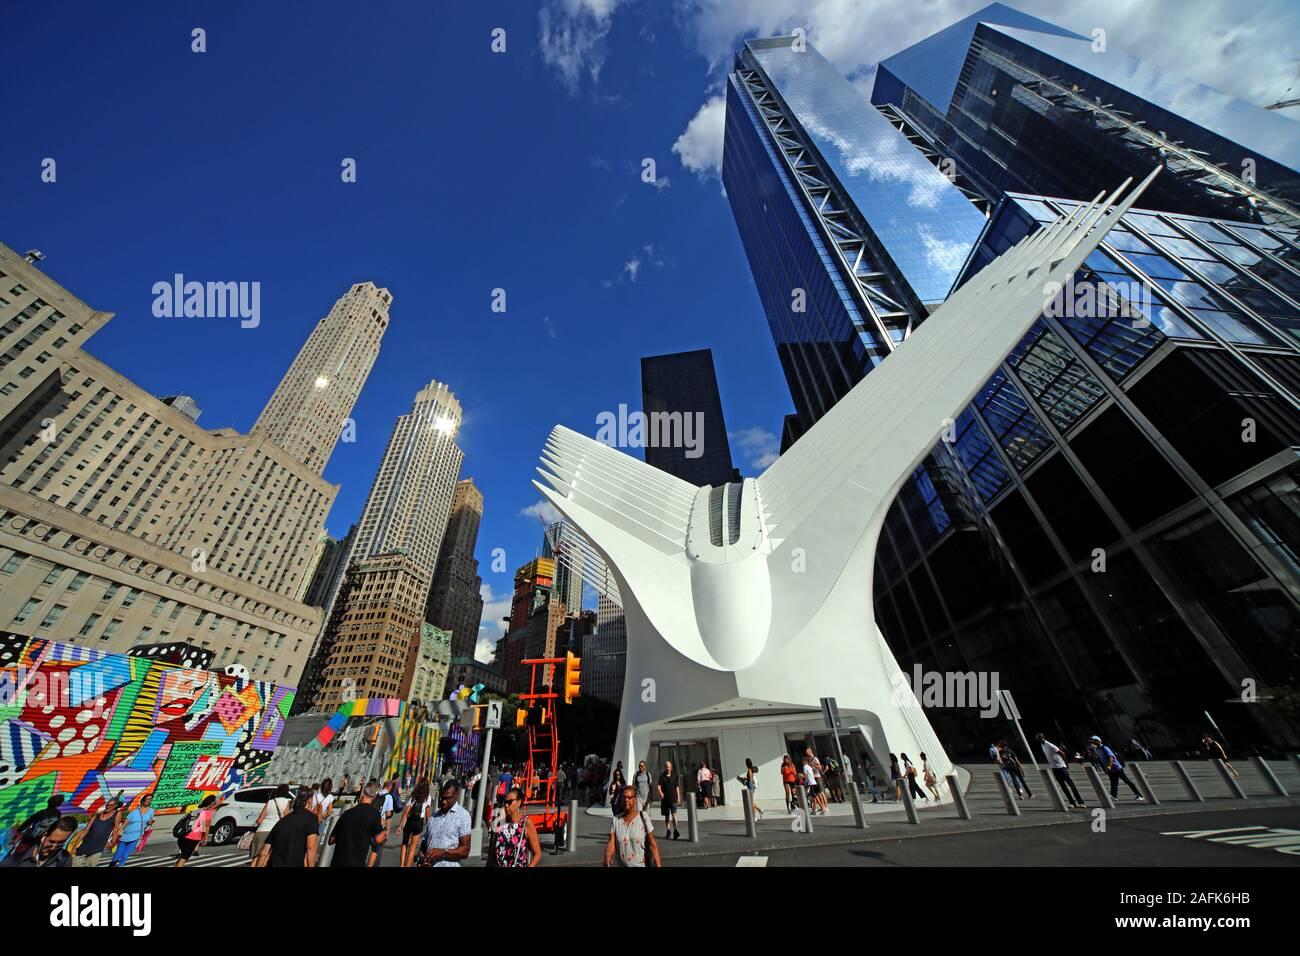 HotpixUK,@HotpixUk,GoTonySmith,NYC,NY,Manhattan,USA,city,city centre,US,building,buildings,new buildings,wide,wideangle,Freedom Tower,WTC,looking up,sky,skyward,museum,transportation hub,New York Skyline,Manhattan Skyline,9/11,water,skyline